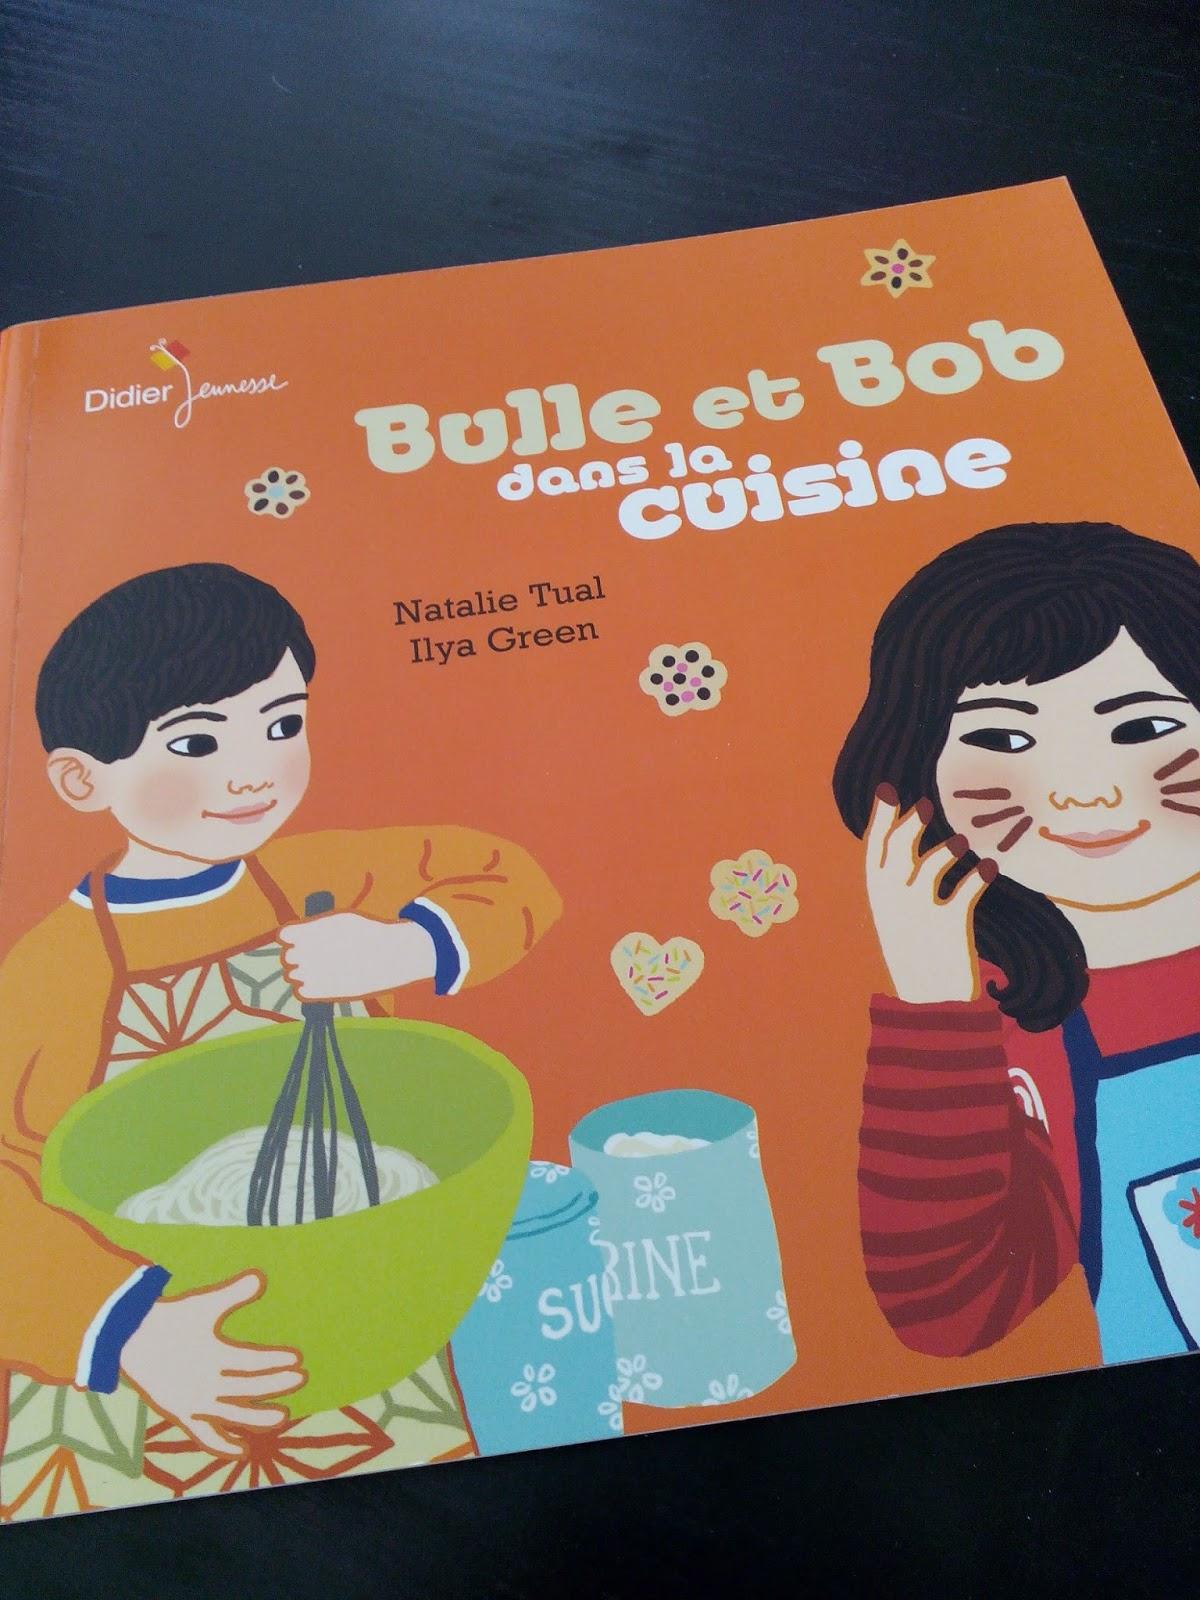 Bulle Et Bob Dans La Cuisine : bulle, cuisine, Feuillage:, Bulle, Cuisine, Série,